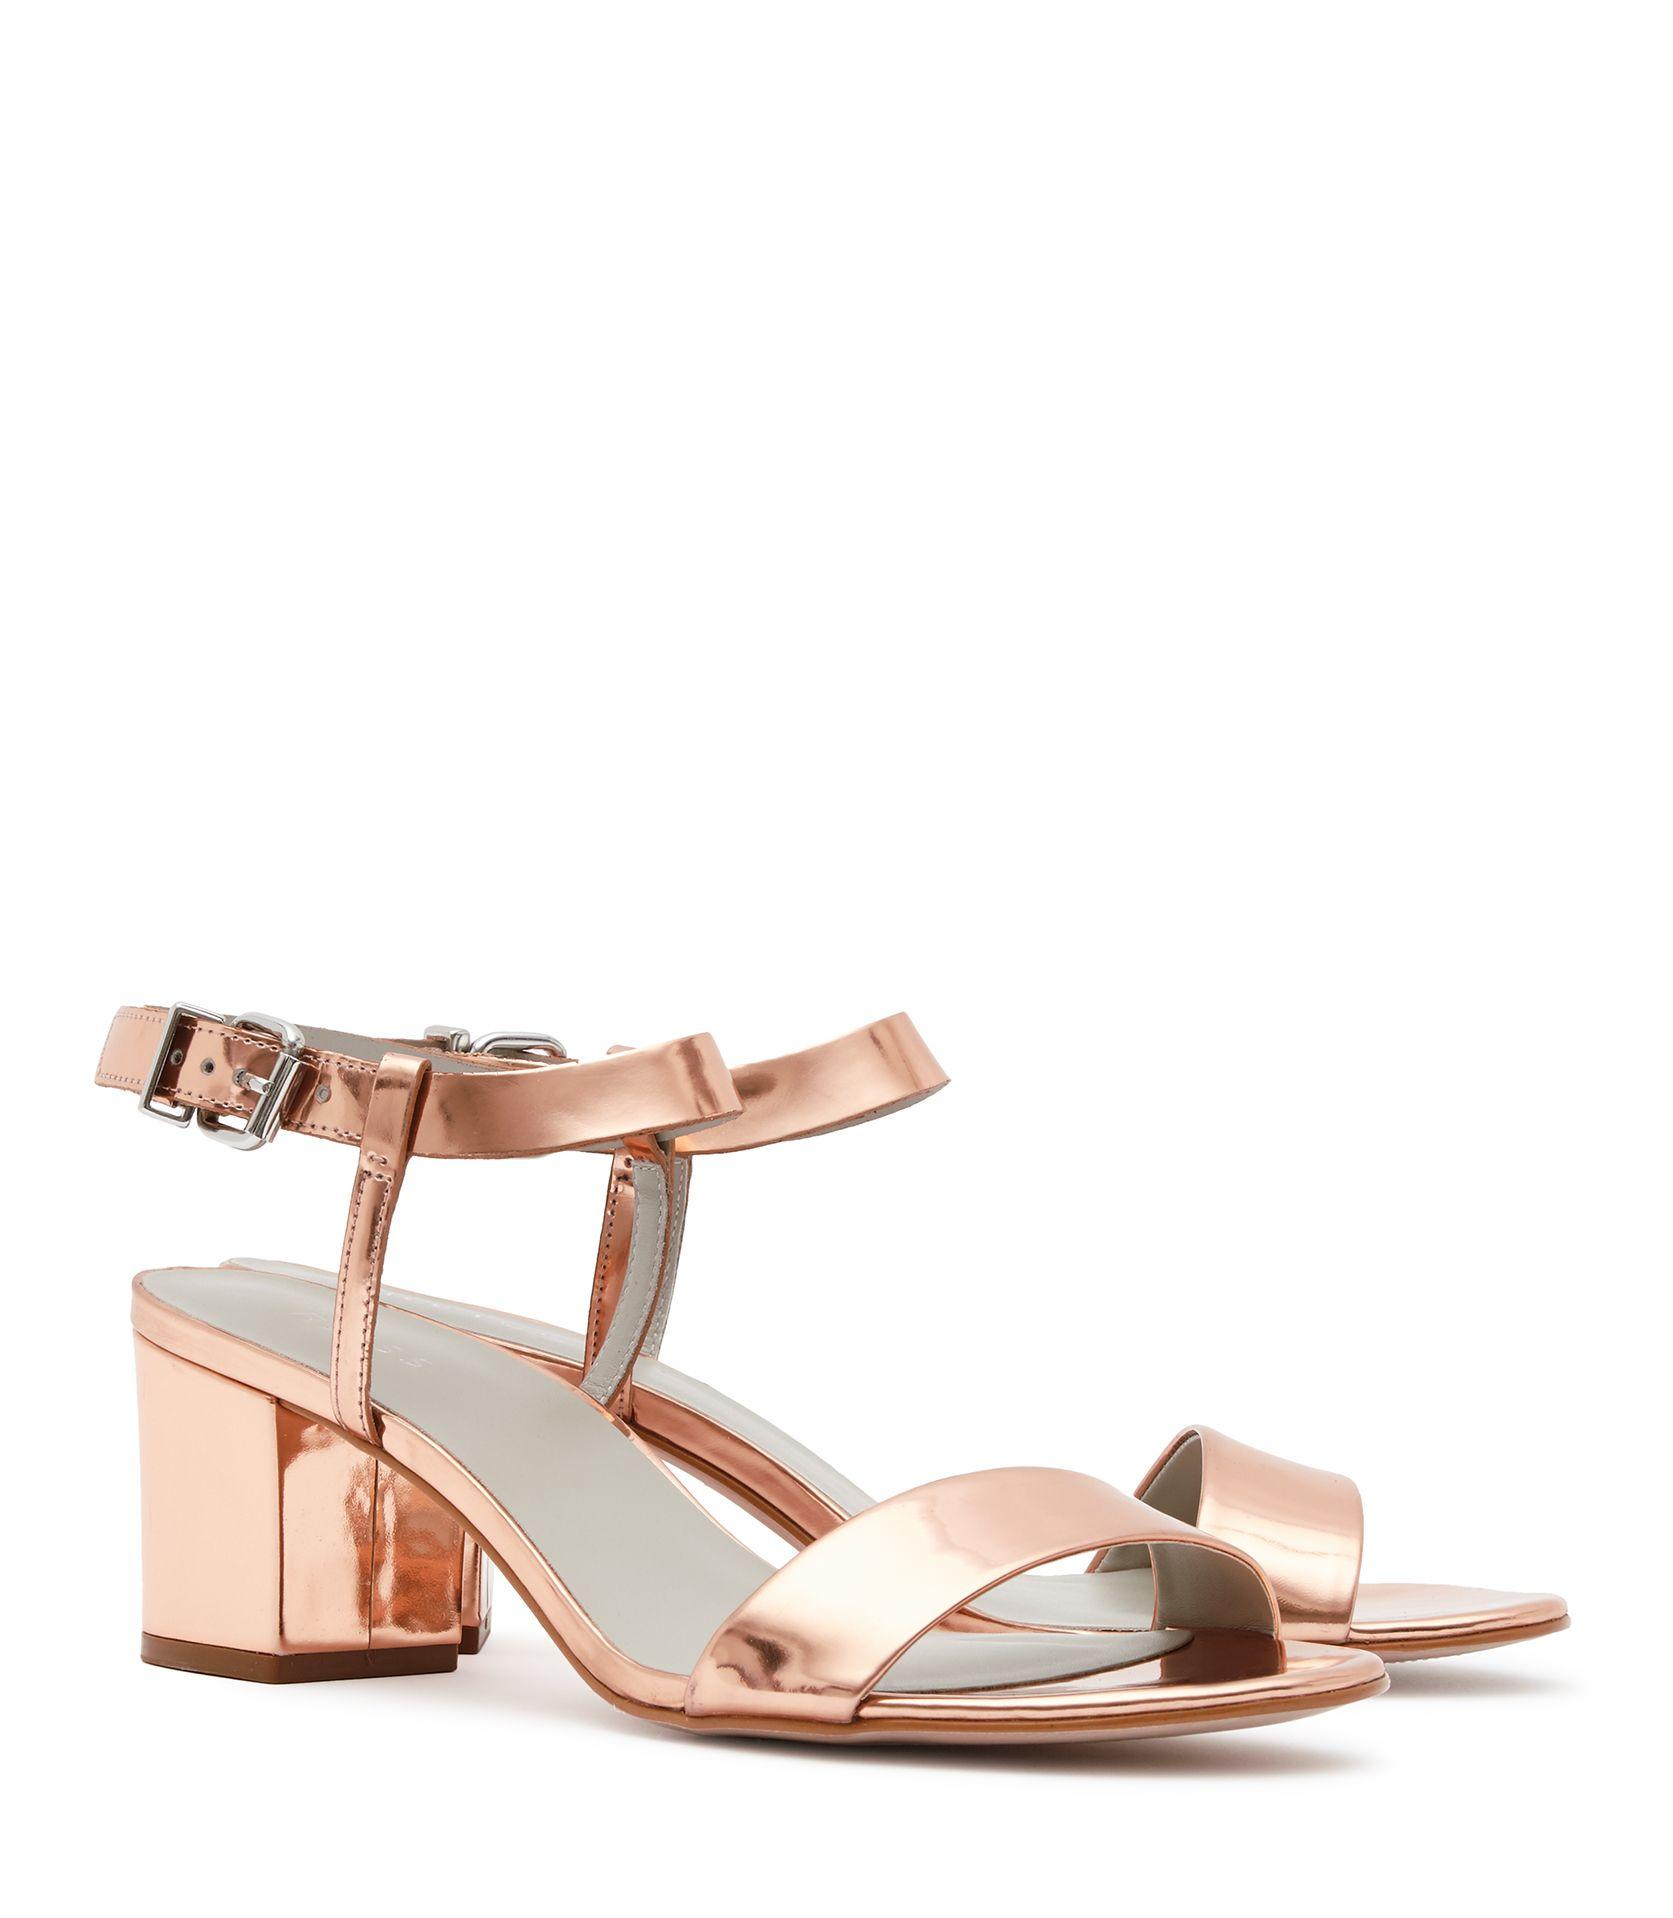 Bag womens rose gold block mid heel sandals